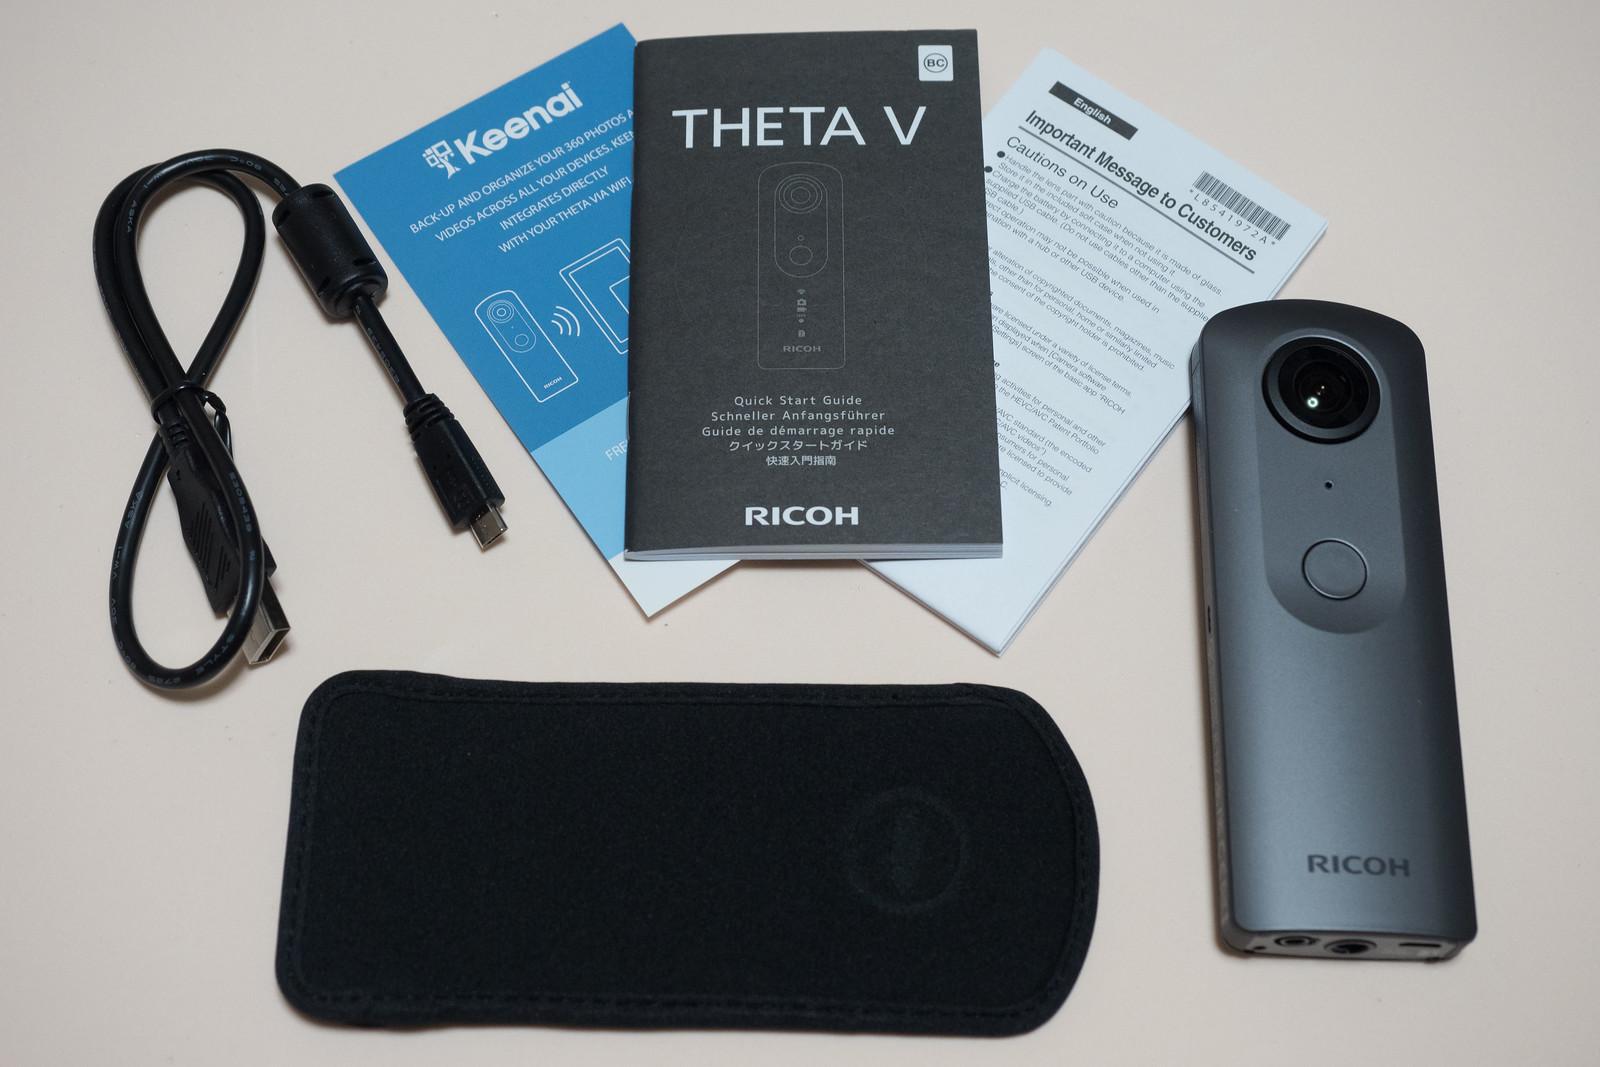 THETA_V-4